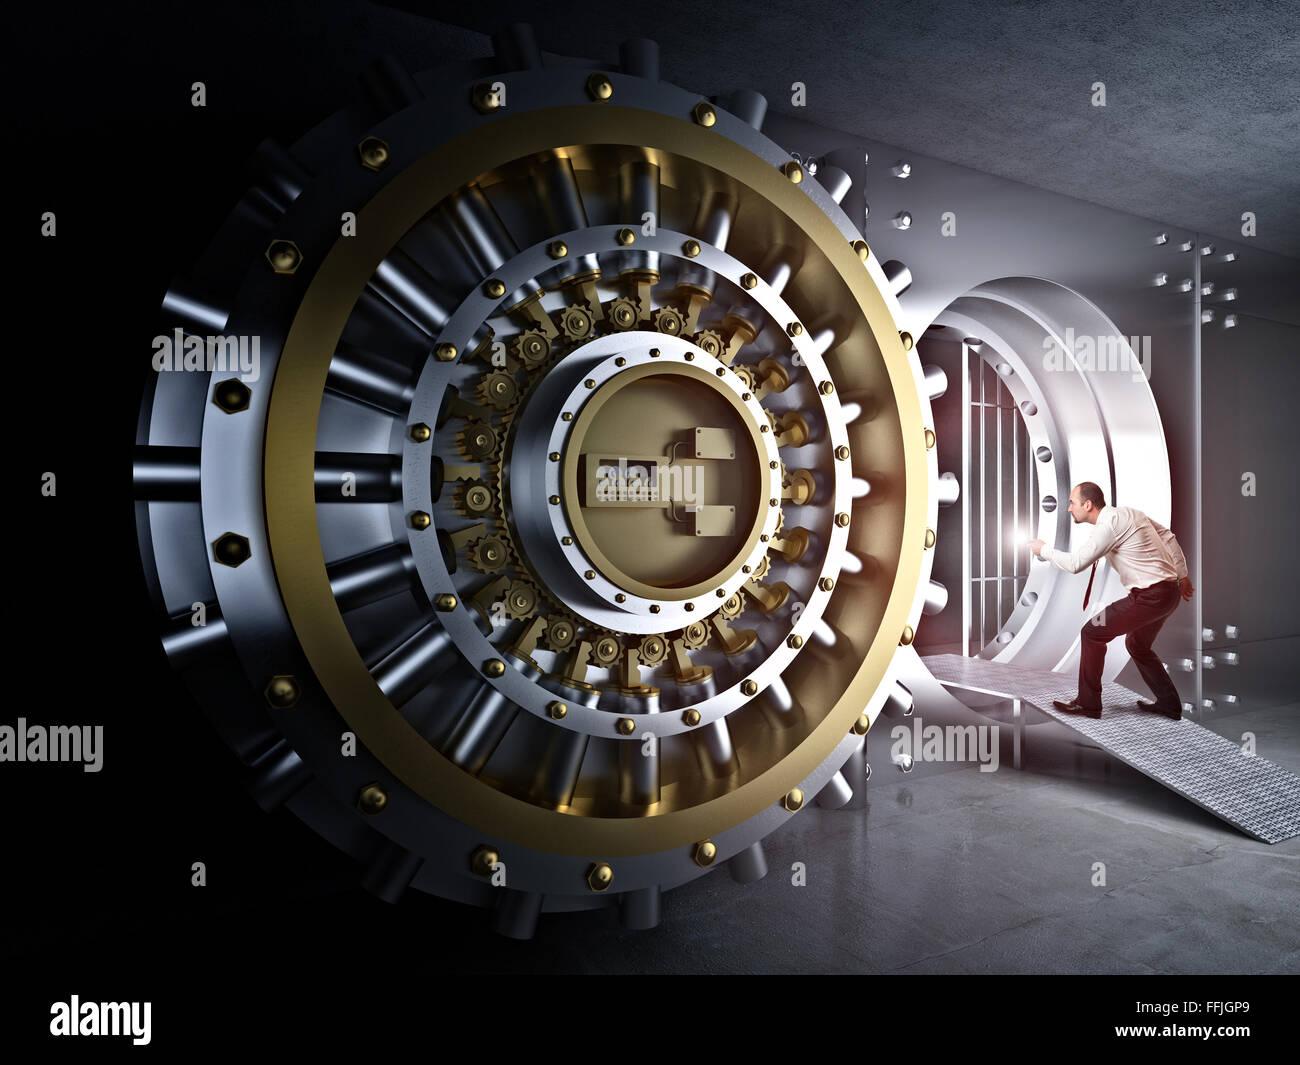 man with flashlight and vault bank door - Stock Image